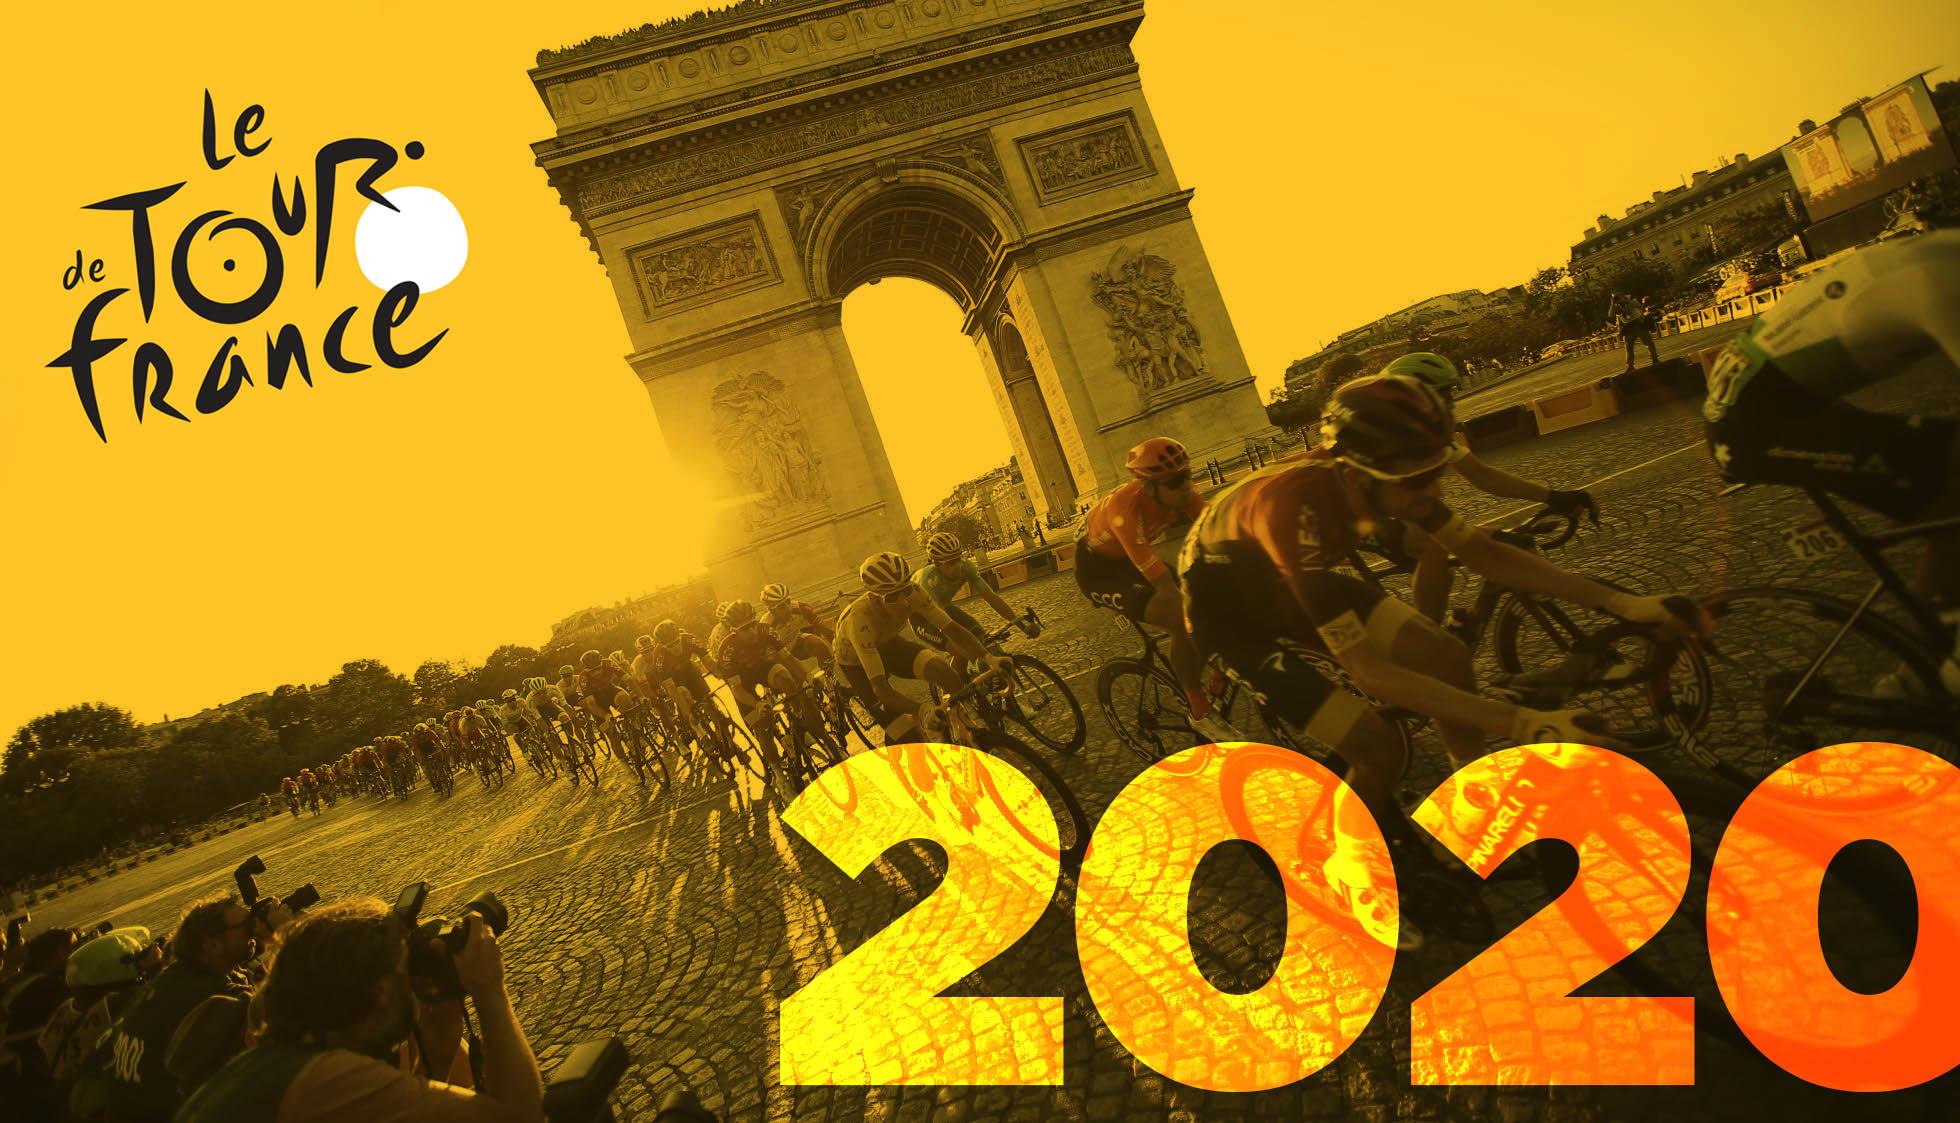 tour de francia 2020 - recorrido, favoritos y perfiles de etapa